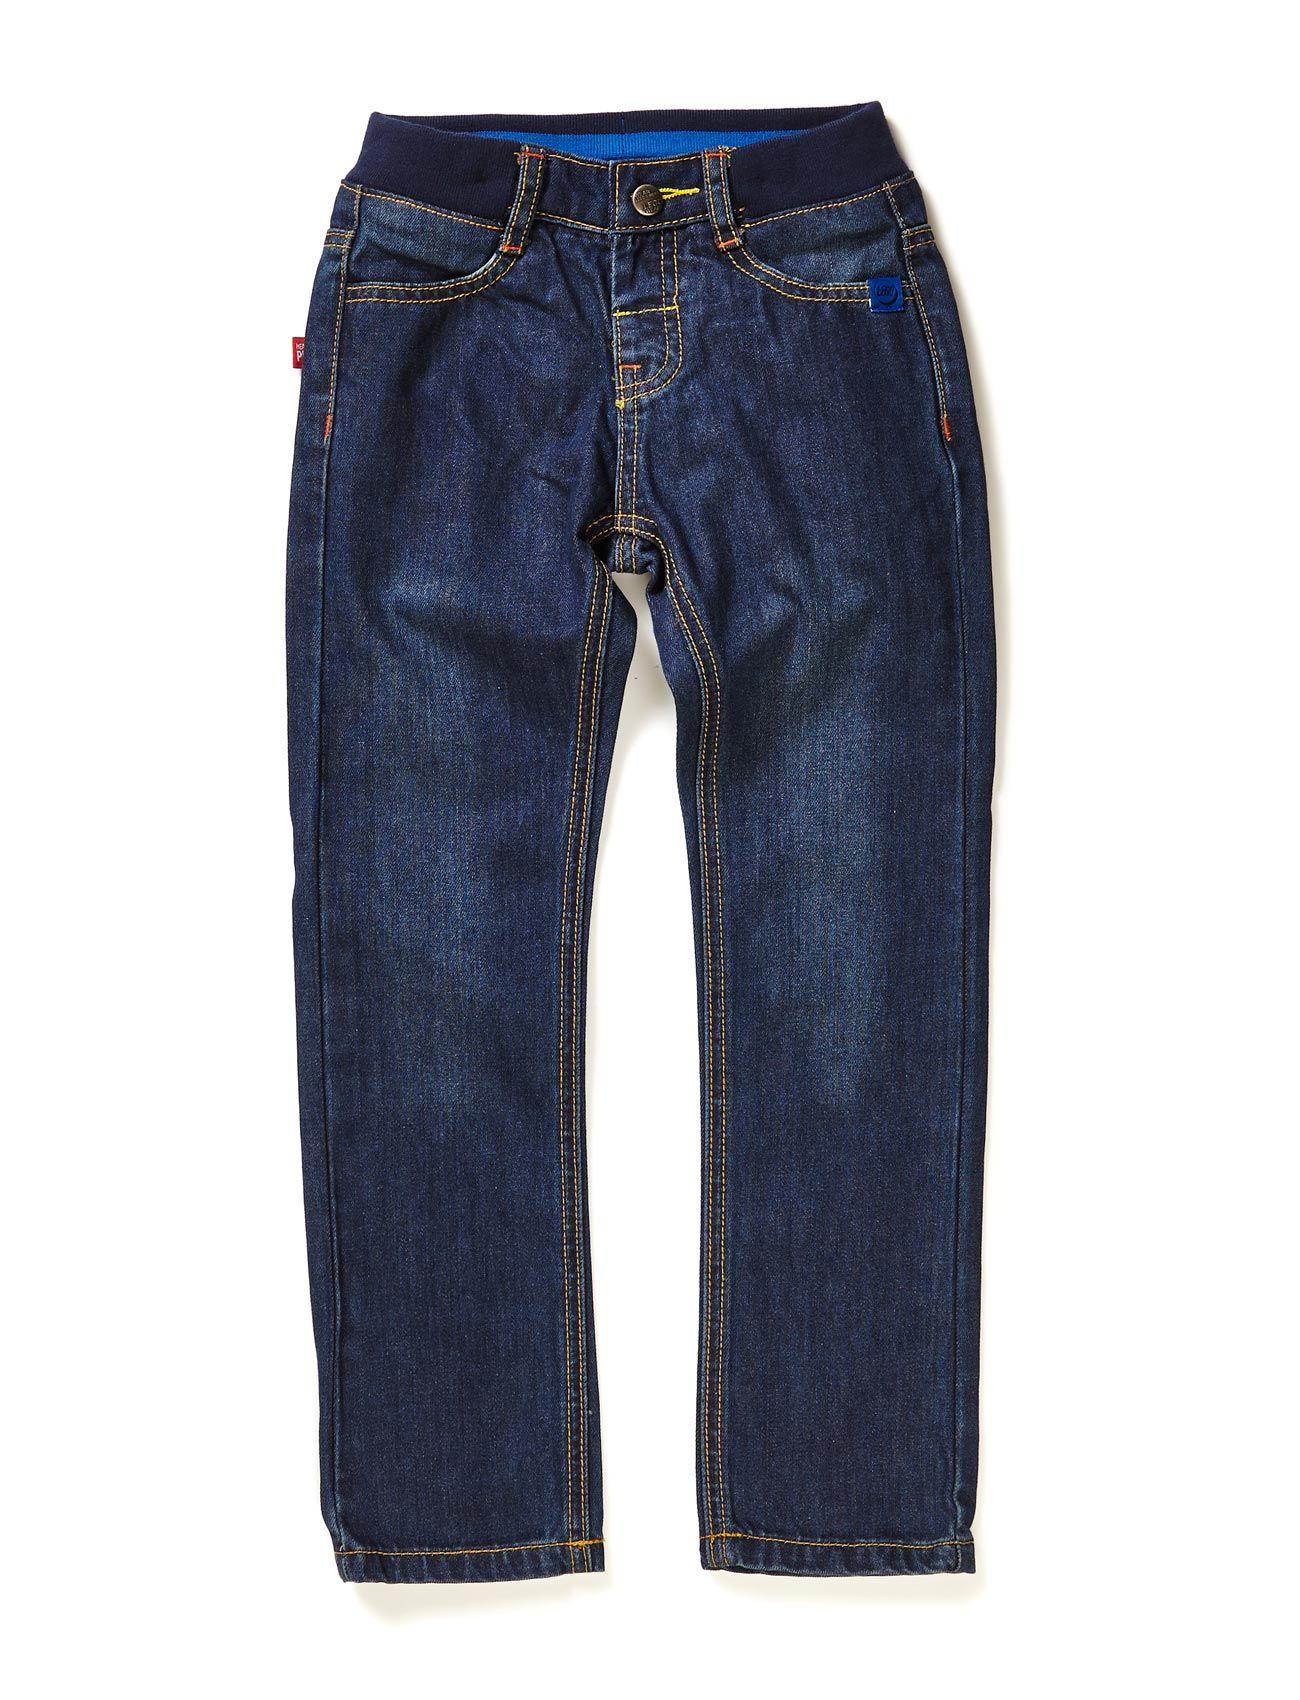 lego wear – Creative 502 - jeans på boozt.com dk